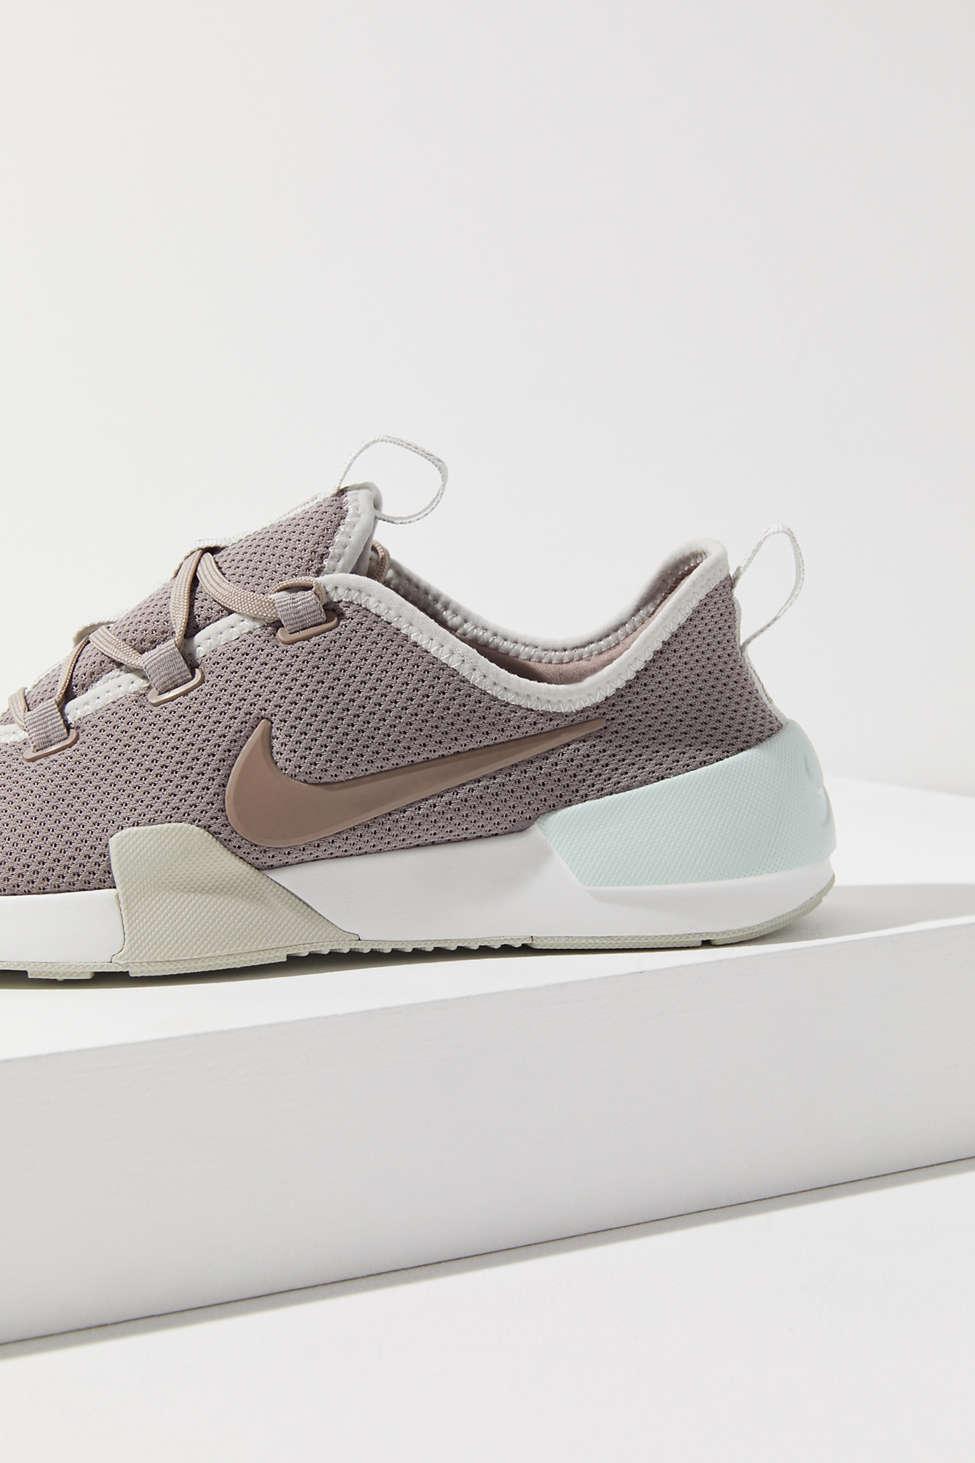 Nike Urban Shoes Style Guru Fashion Glitz Glamour